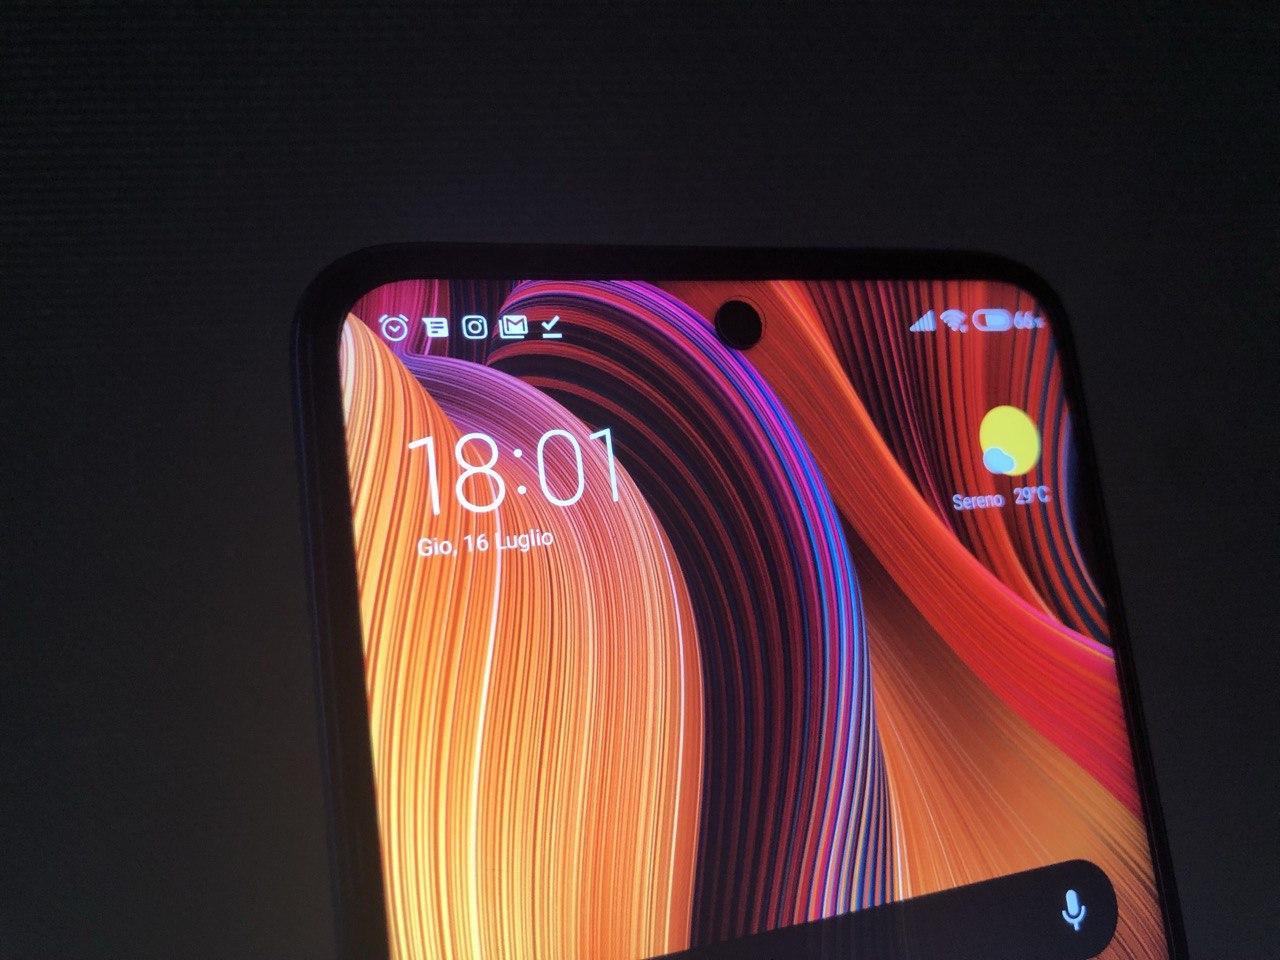 Xiaomi Redmi Note 9S - Recensione Del Best Buy Per Eccellenza 4 - Hynerd.it